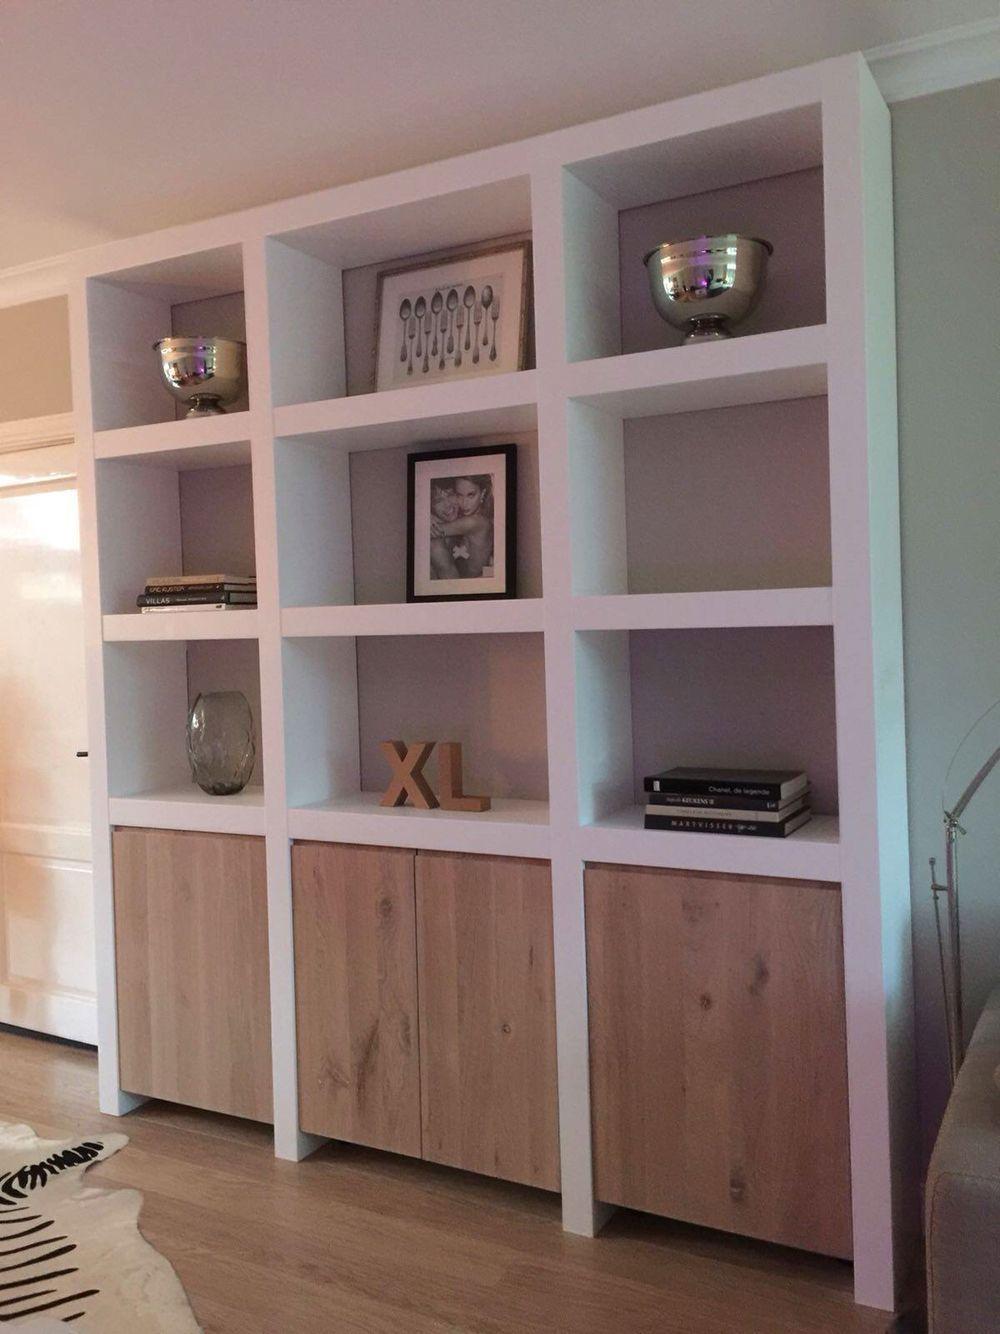 Mooie kast koak design  Pladur salncomedor  Pinterest  Muebles living Muebles empotrados y Muebles de comedor